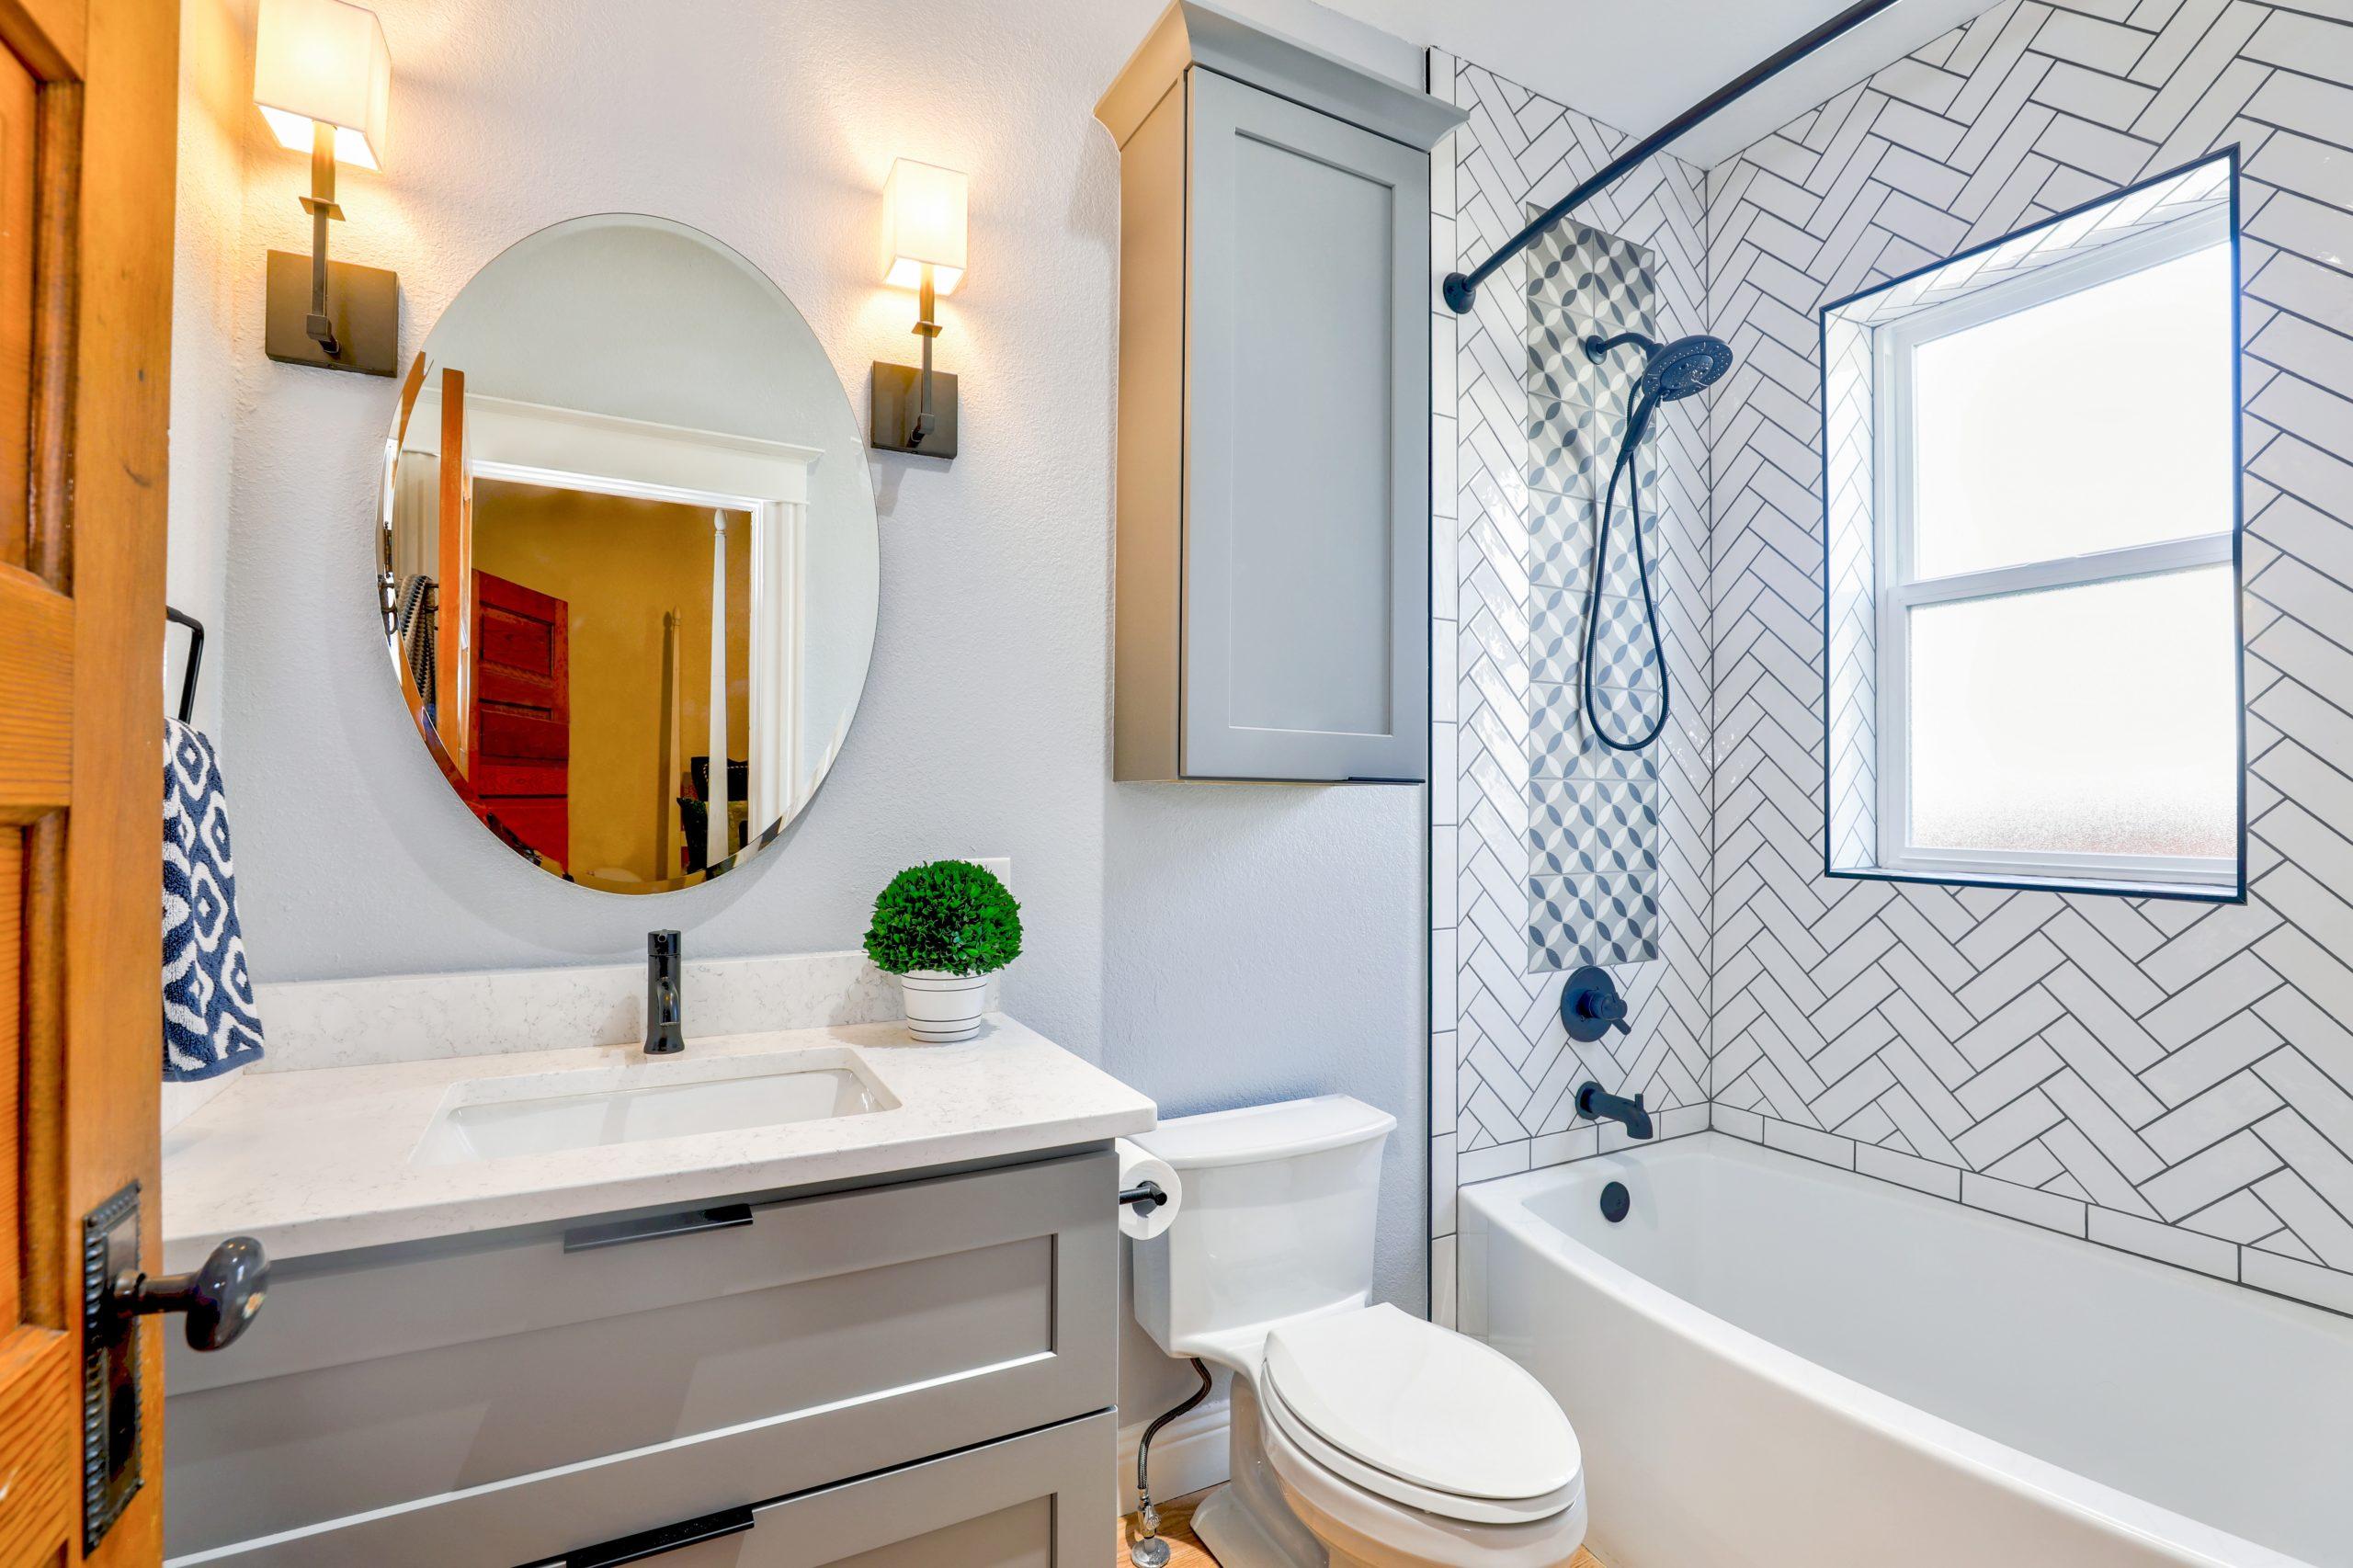 Bathroom Ideas Related to Décor and Design